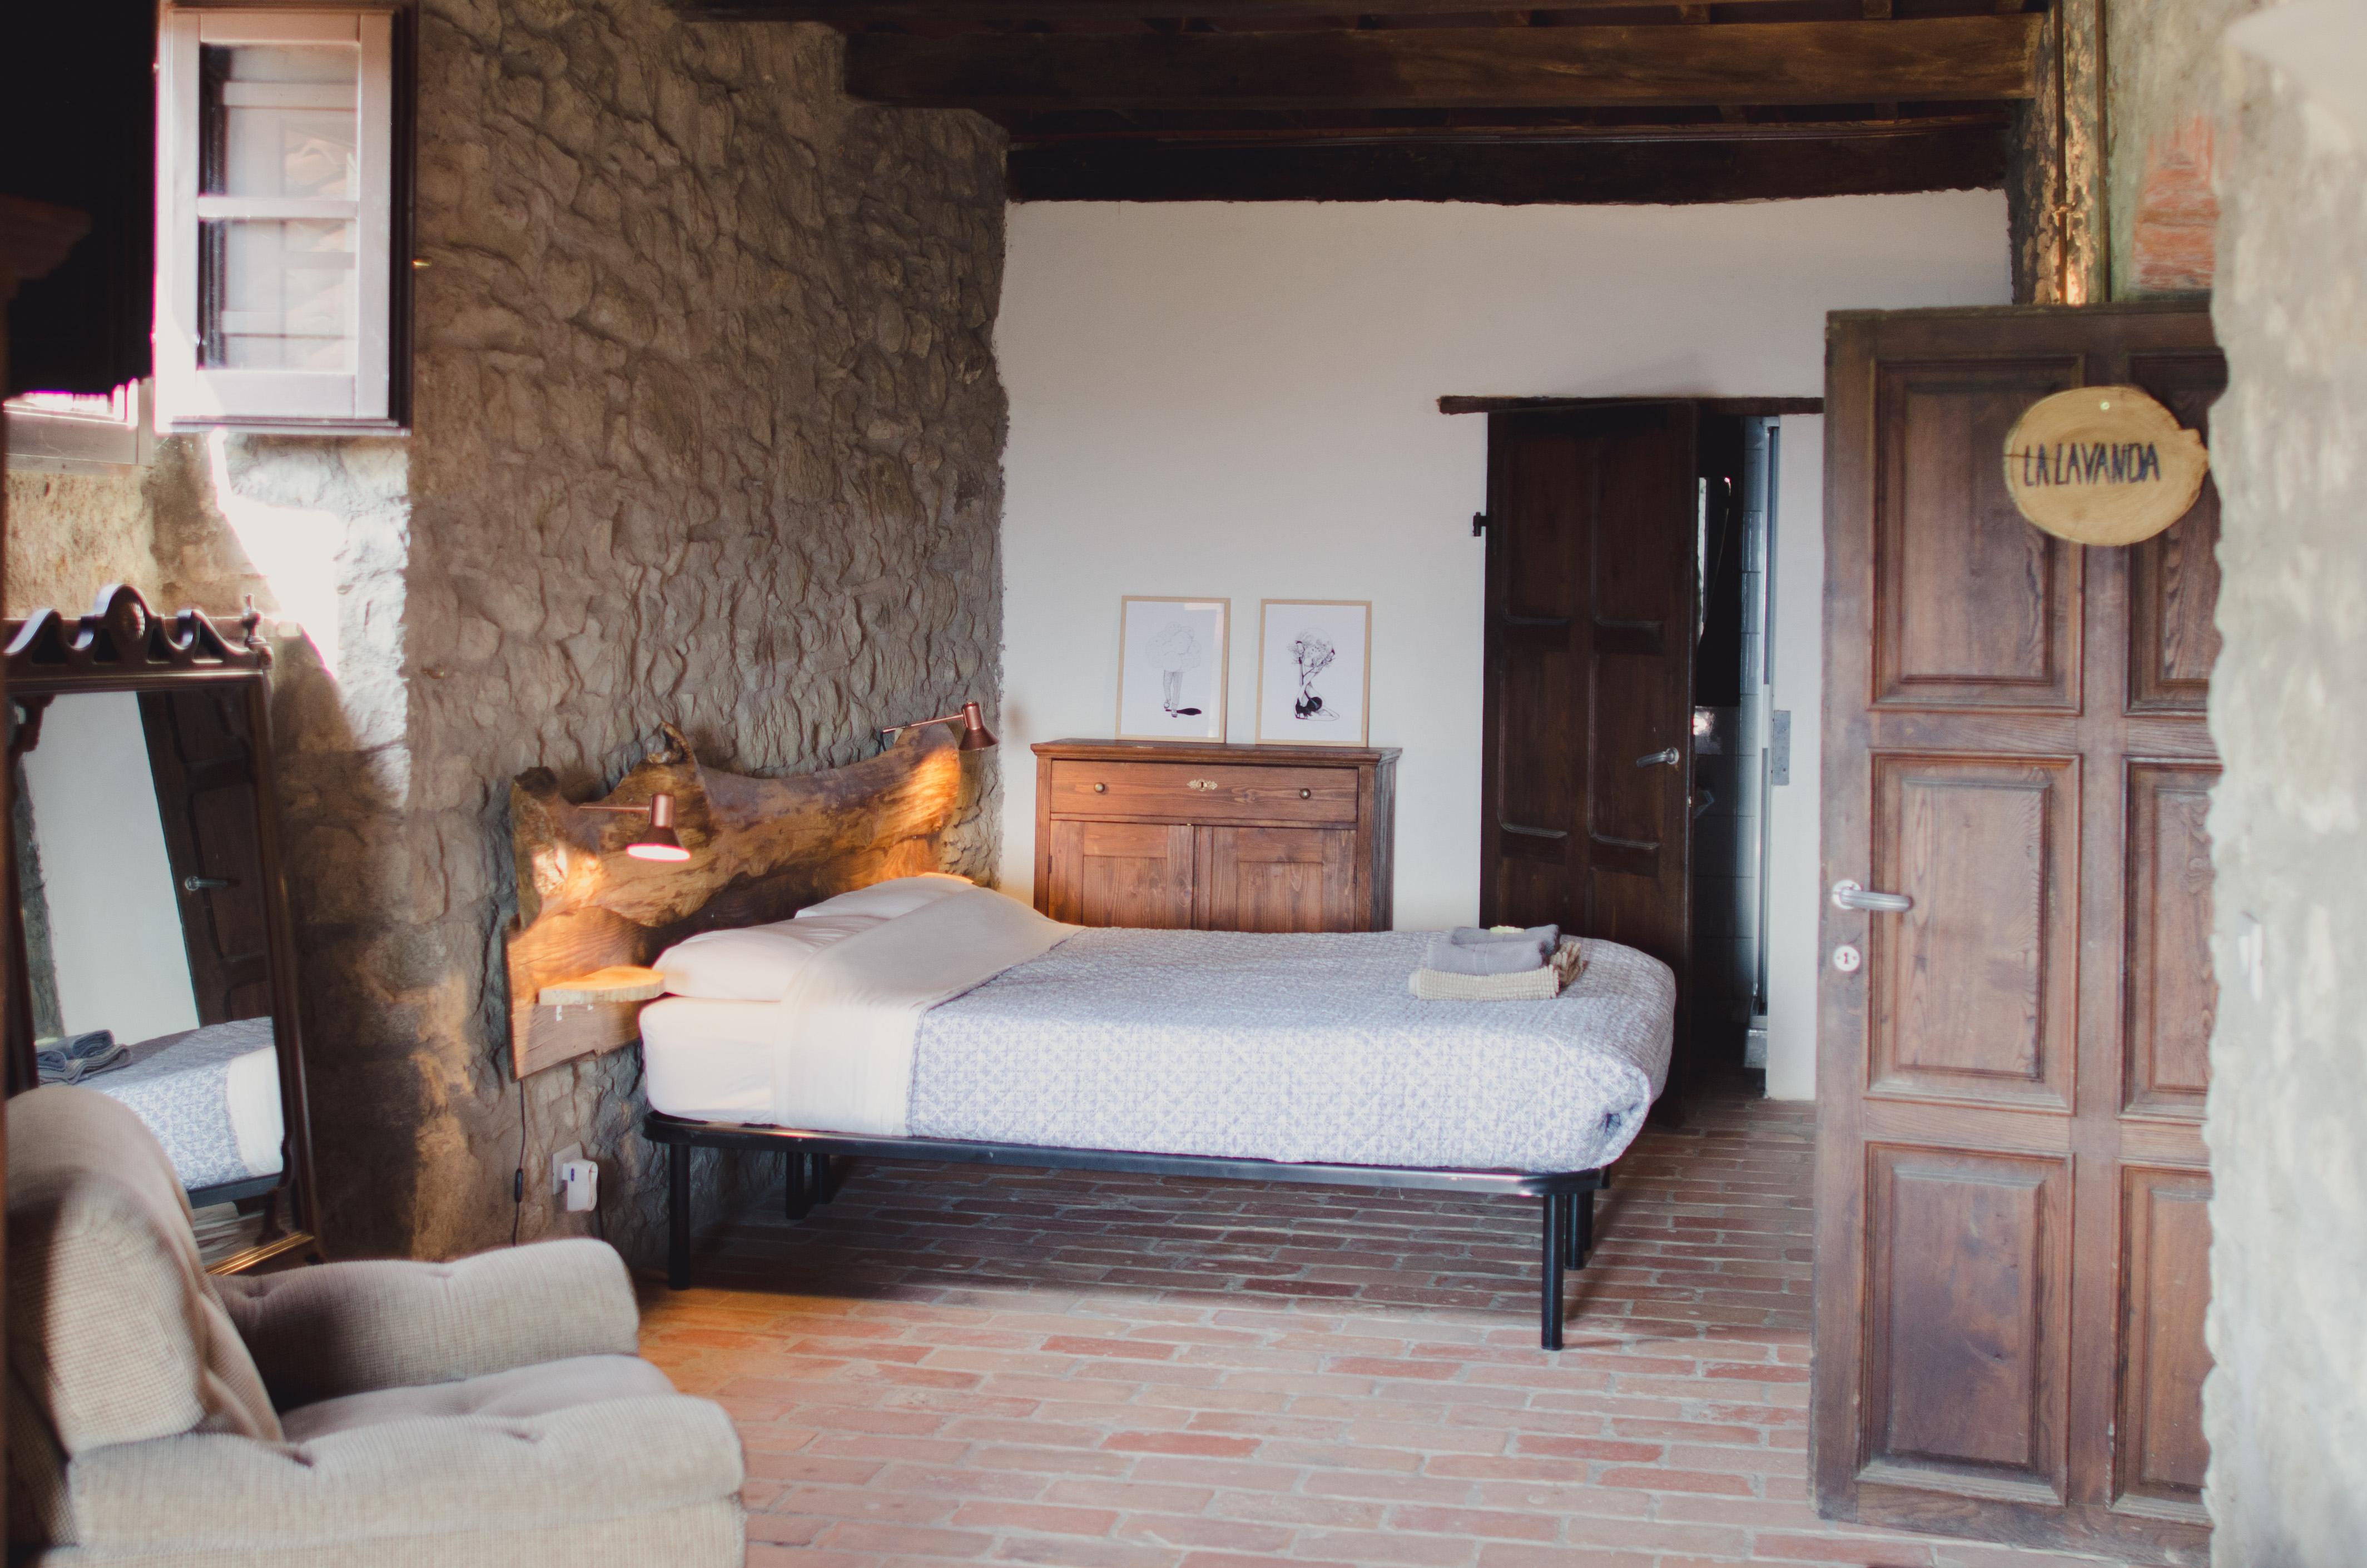 private room novanta